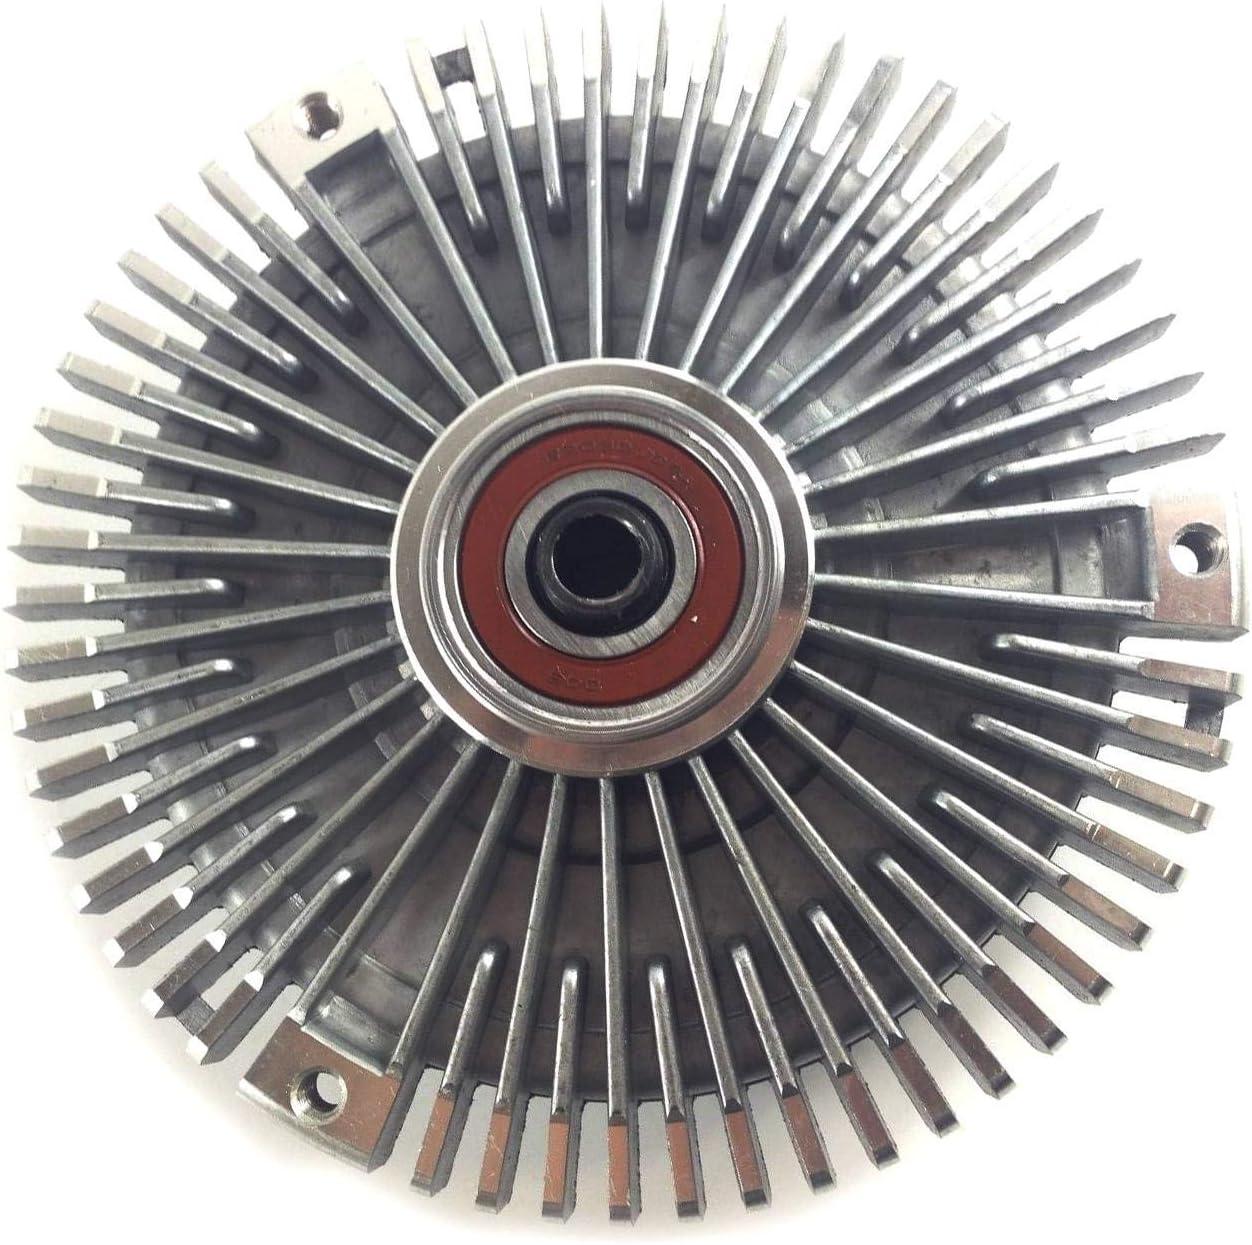 VIOJI 1pcs Radiator Cooling Fan Visco Clutch 1032000522 for 1987-1993 Mercedes-Benz 190E 2.6 Sedan W201